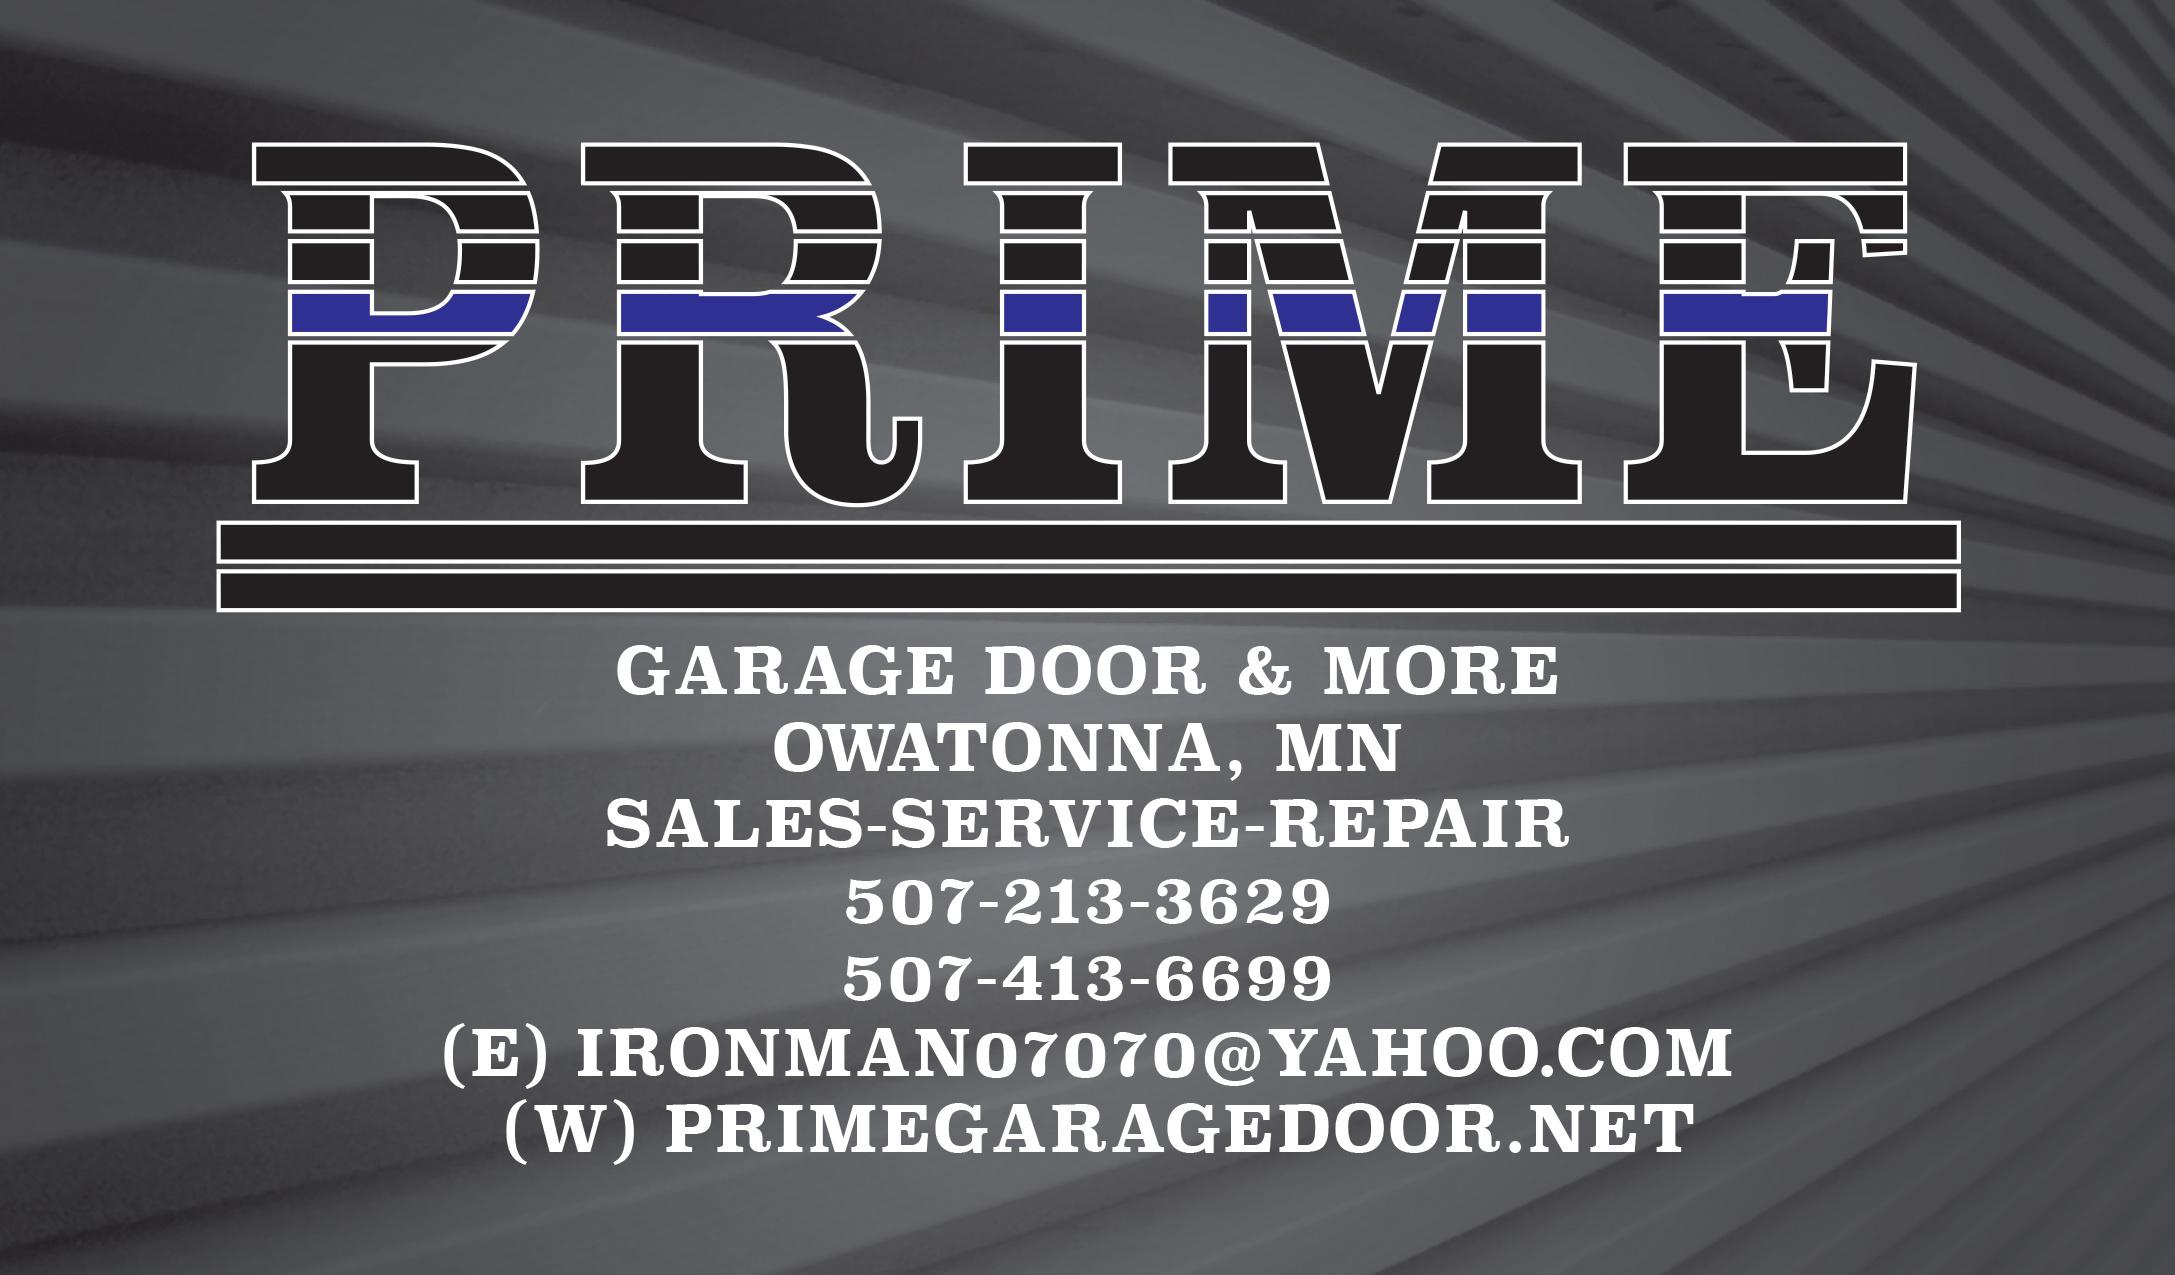 Prime garage door does installs repairs more in for Garage door repair minneapolis